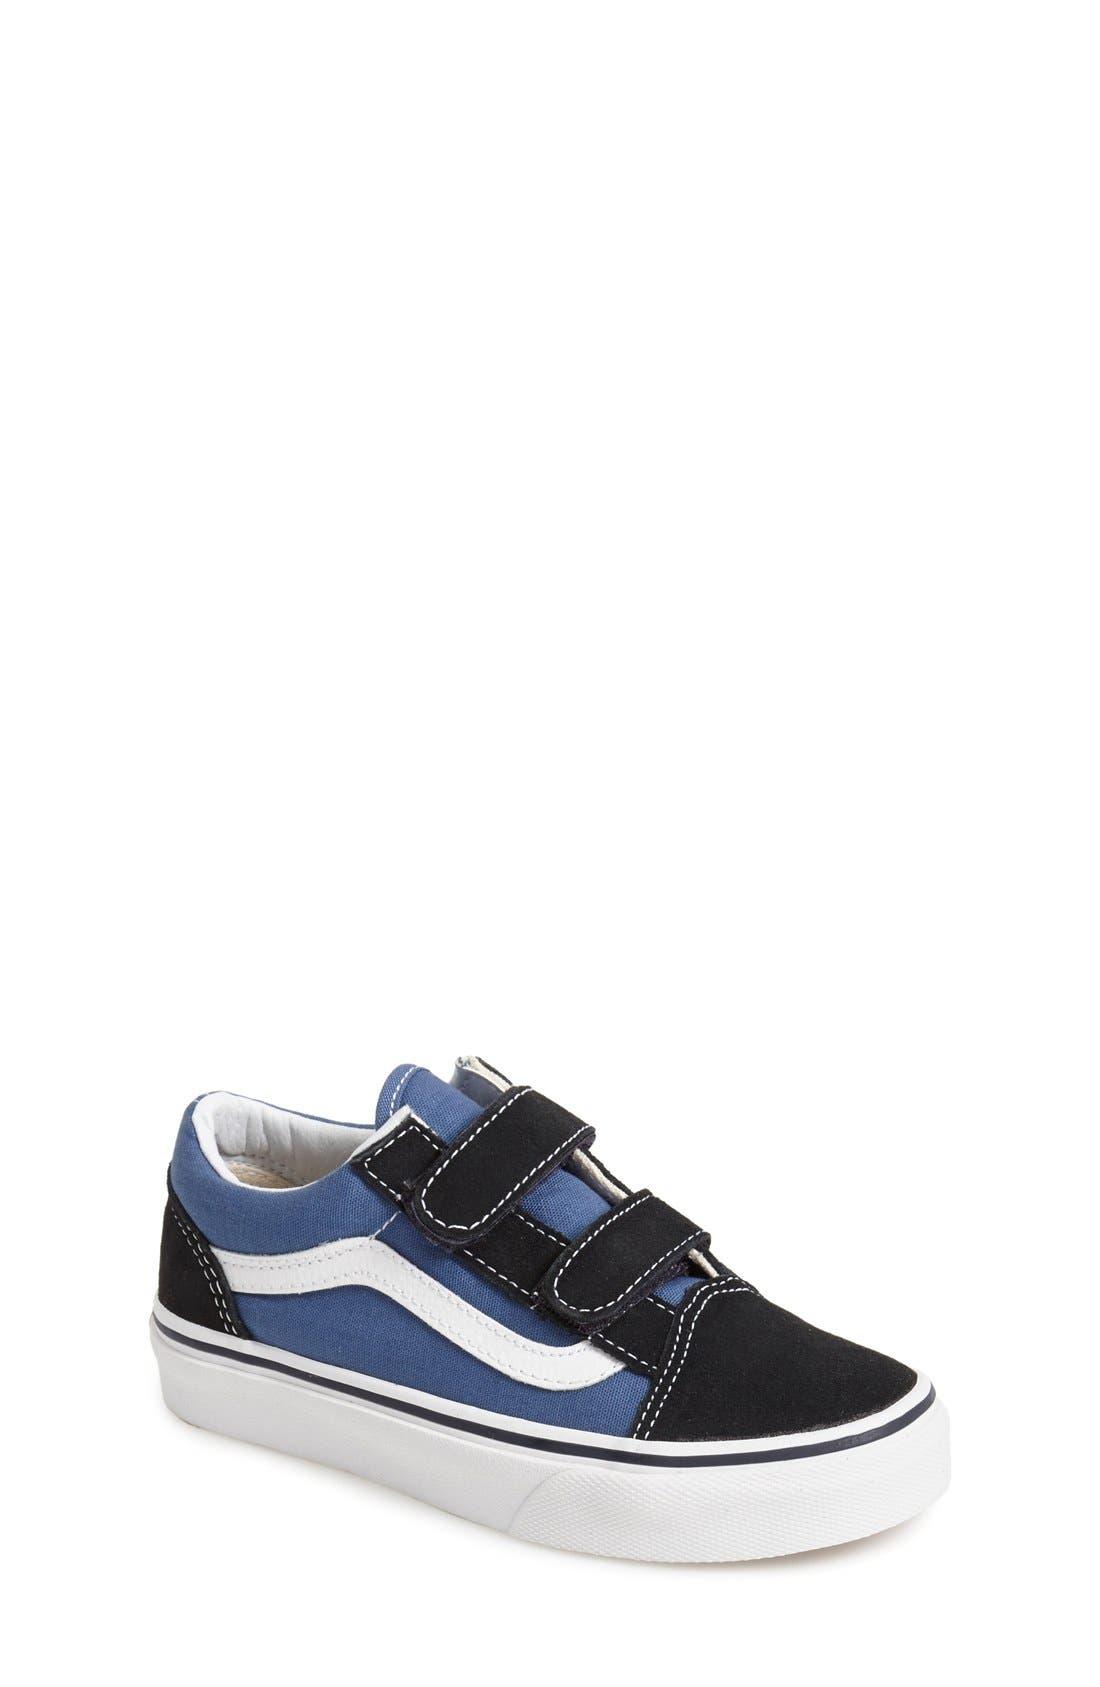 'Old Skool V' Sneaker,                         Main,                         color, Navy/ True White